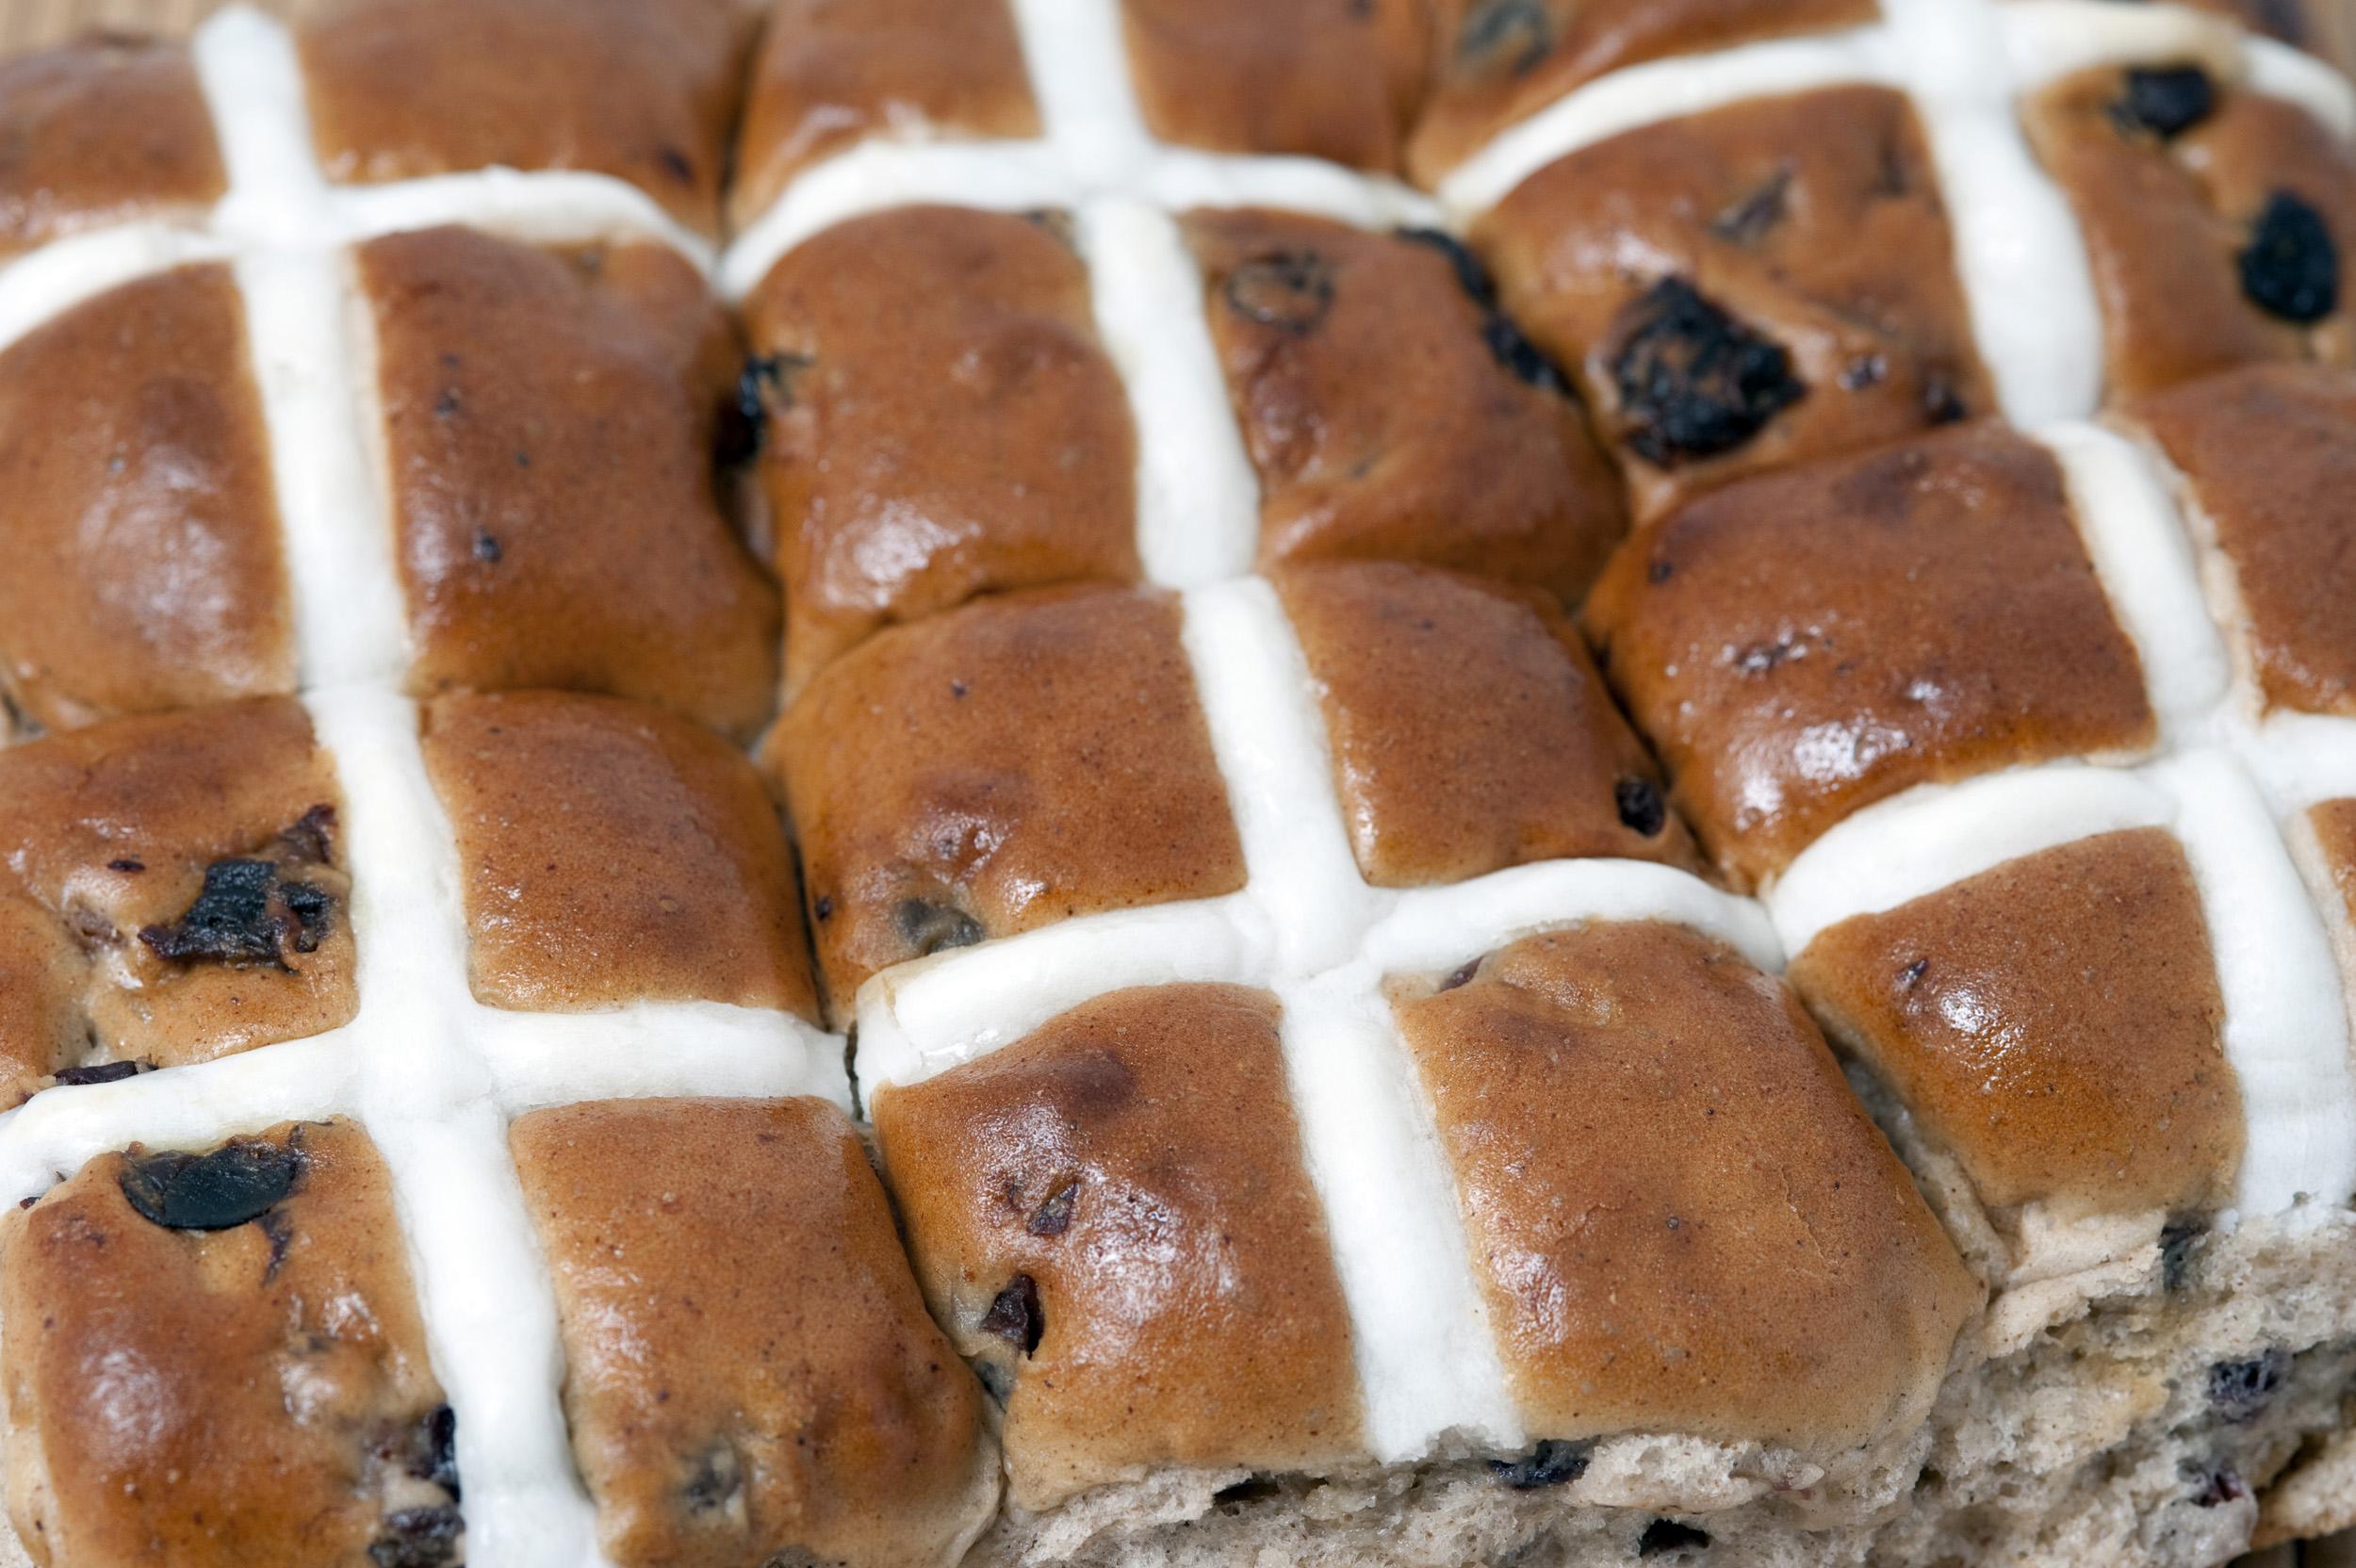 Batch of fresh Hot Cross Buns Creative Commons Stock Image